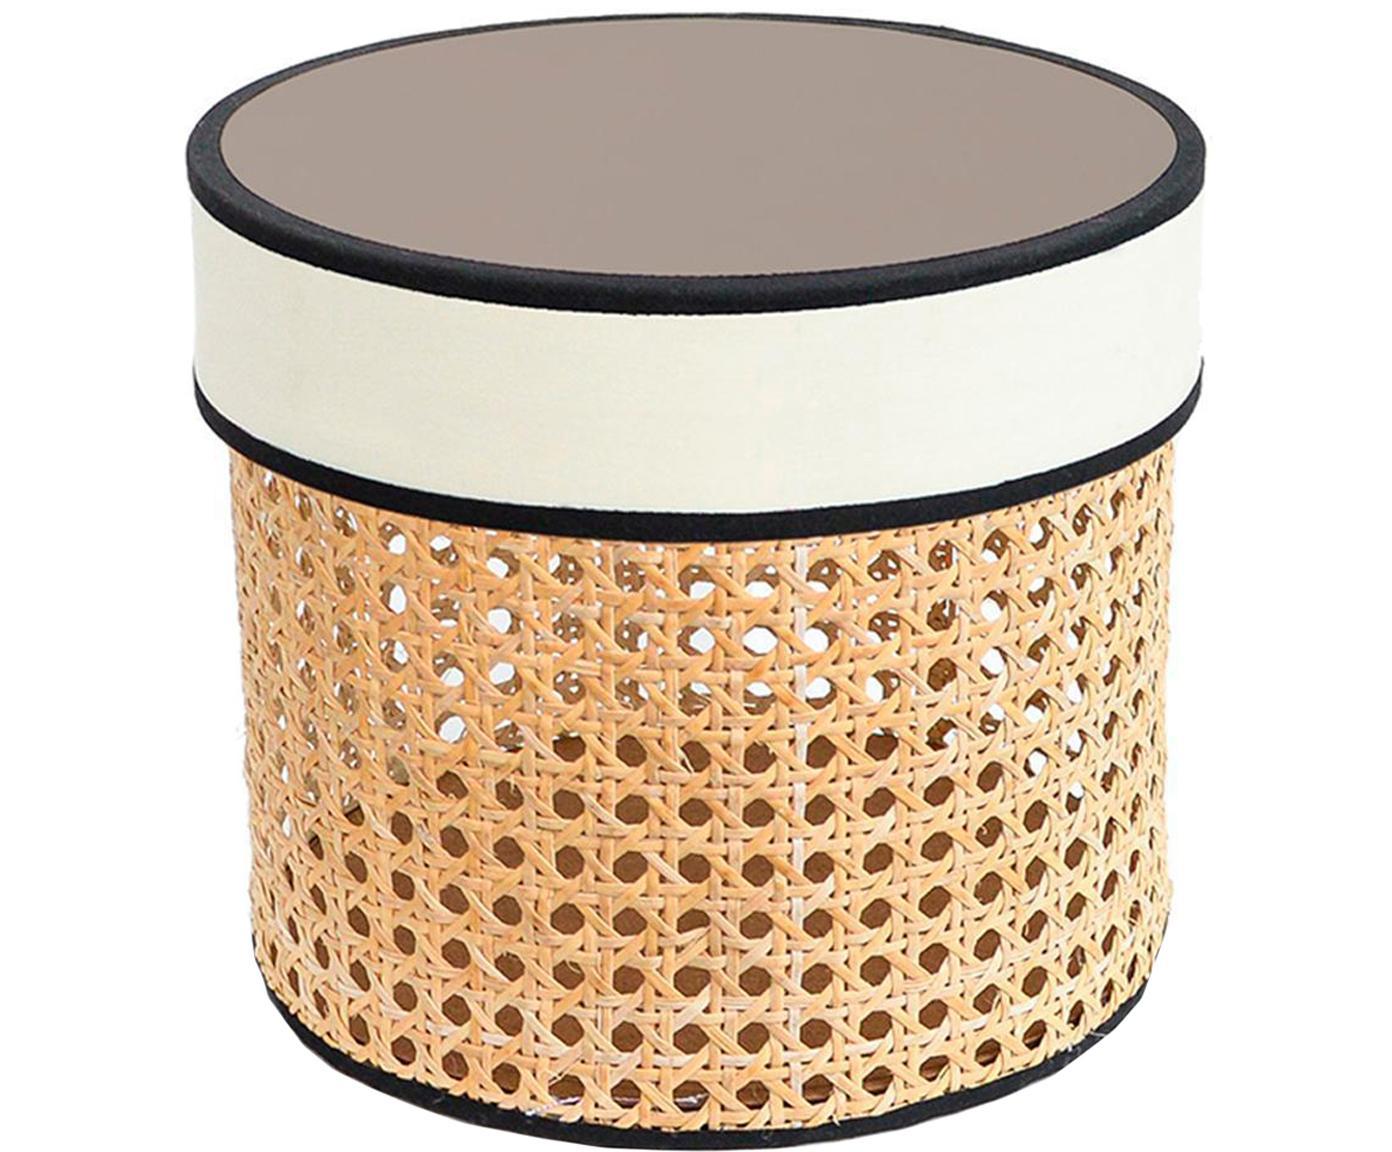 Caja decorativa Pamela, Caja: rejilla, Tapa: tela, fibras de densidad , Beige, blanco, Ø 21 x Al 19 cm